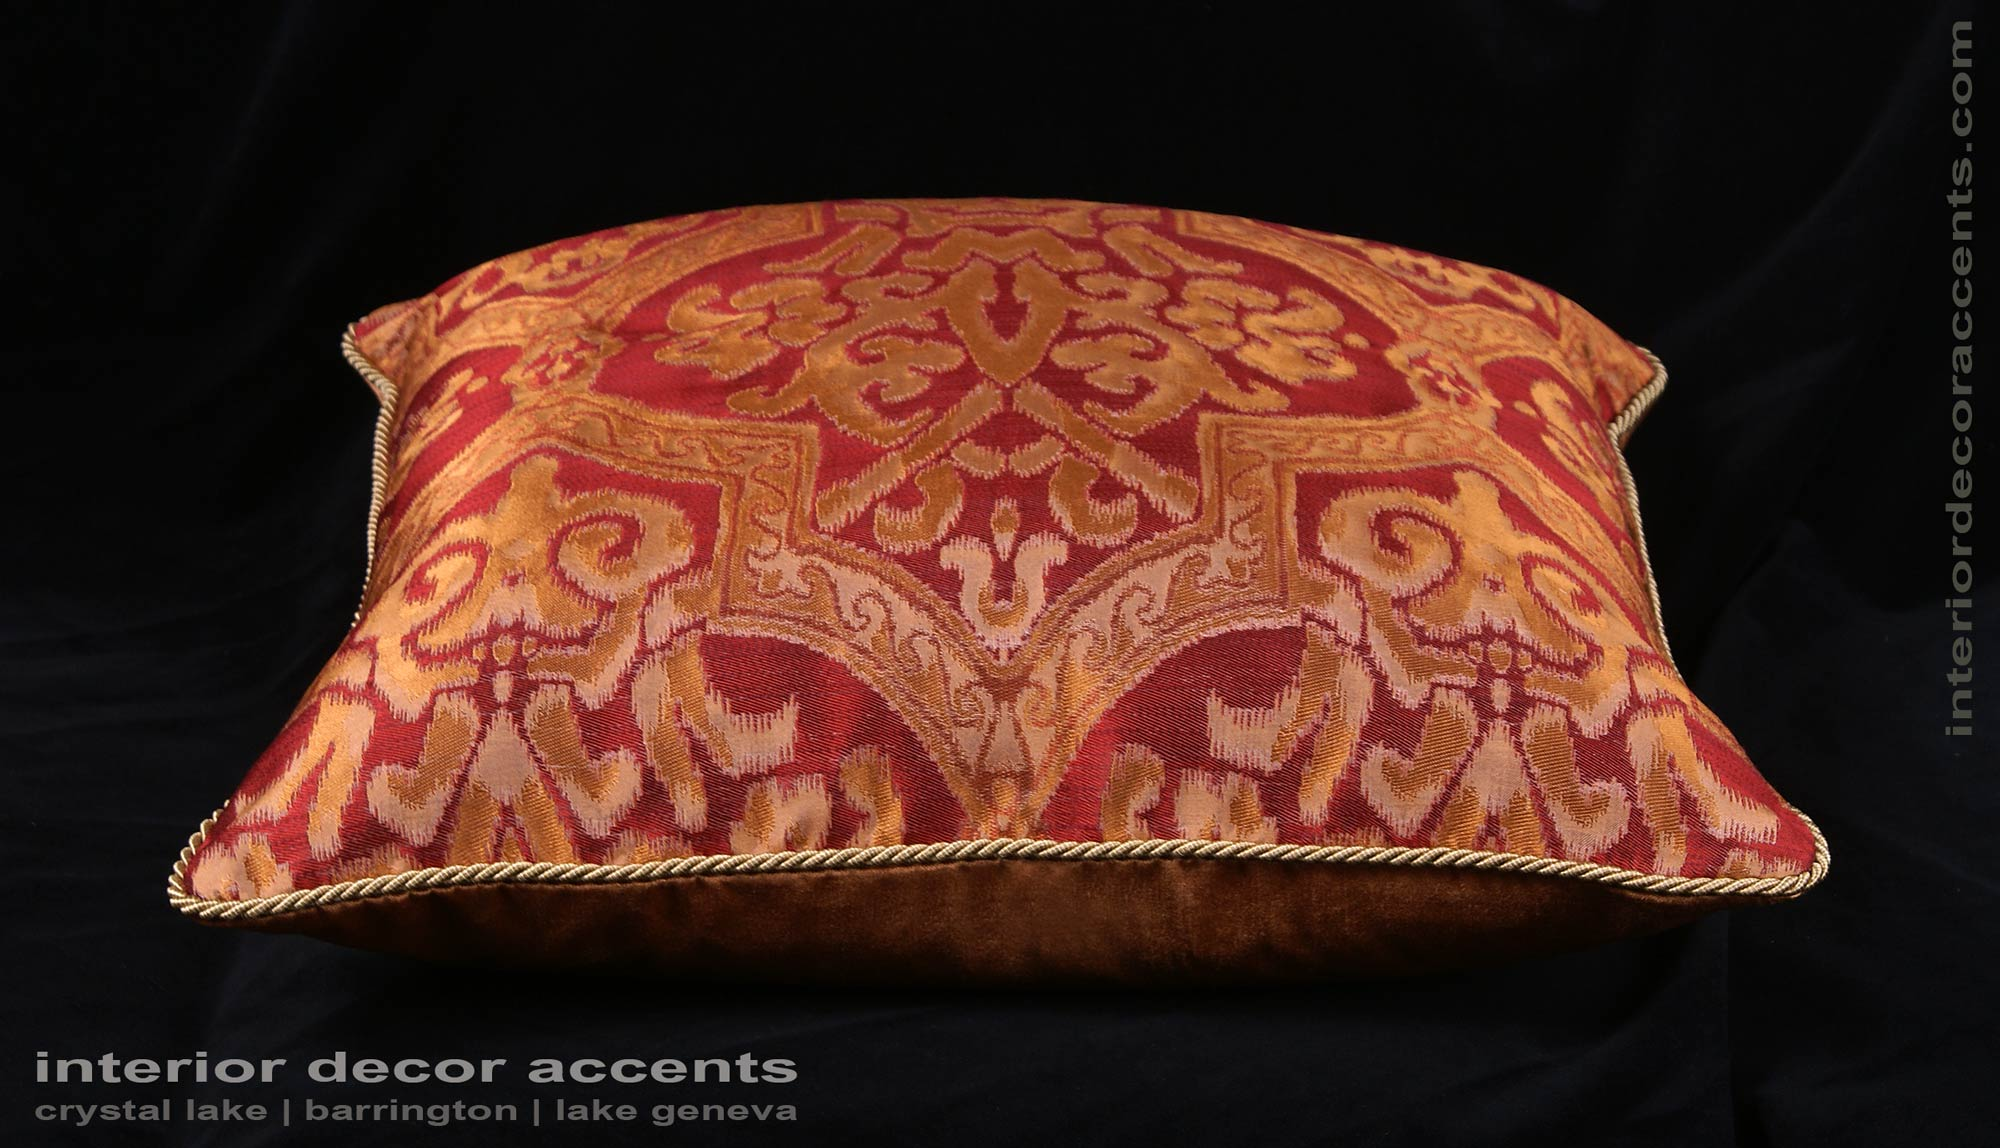 Lee Jofa Silk Jacquard Damask Single Decorative Pillows For Elegant Interiors And Home Decor Accents